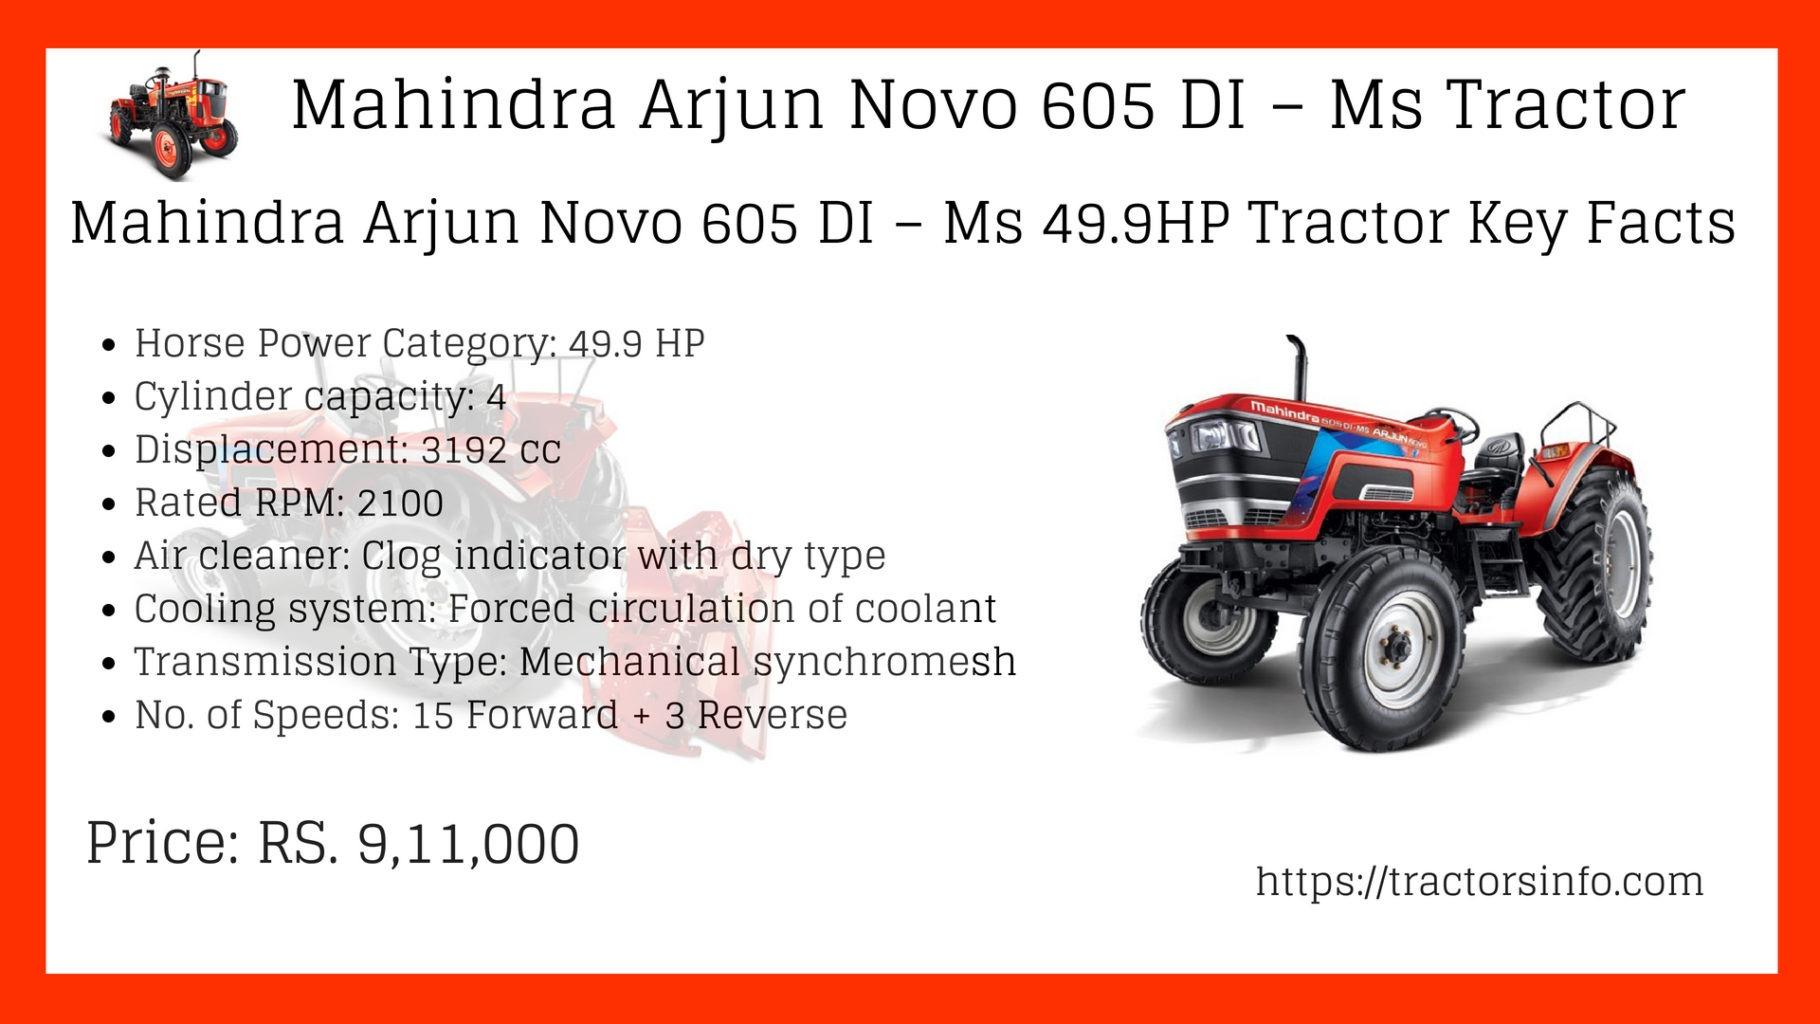 Mahindra Arjun Novo 605 DI – Ms Tractor